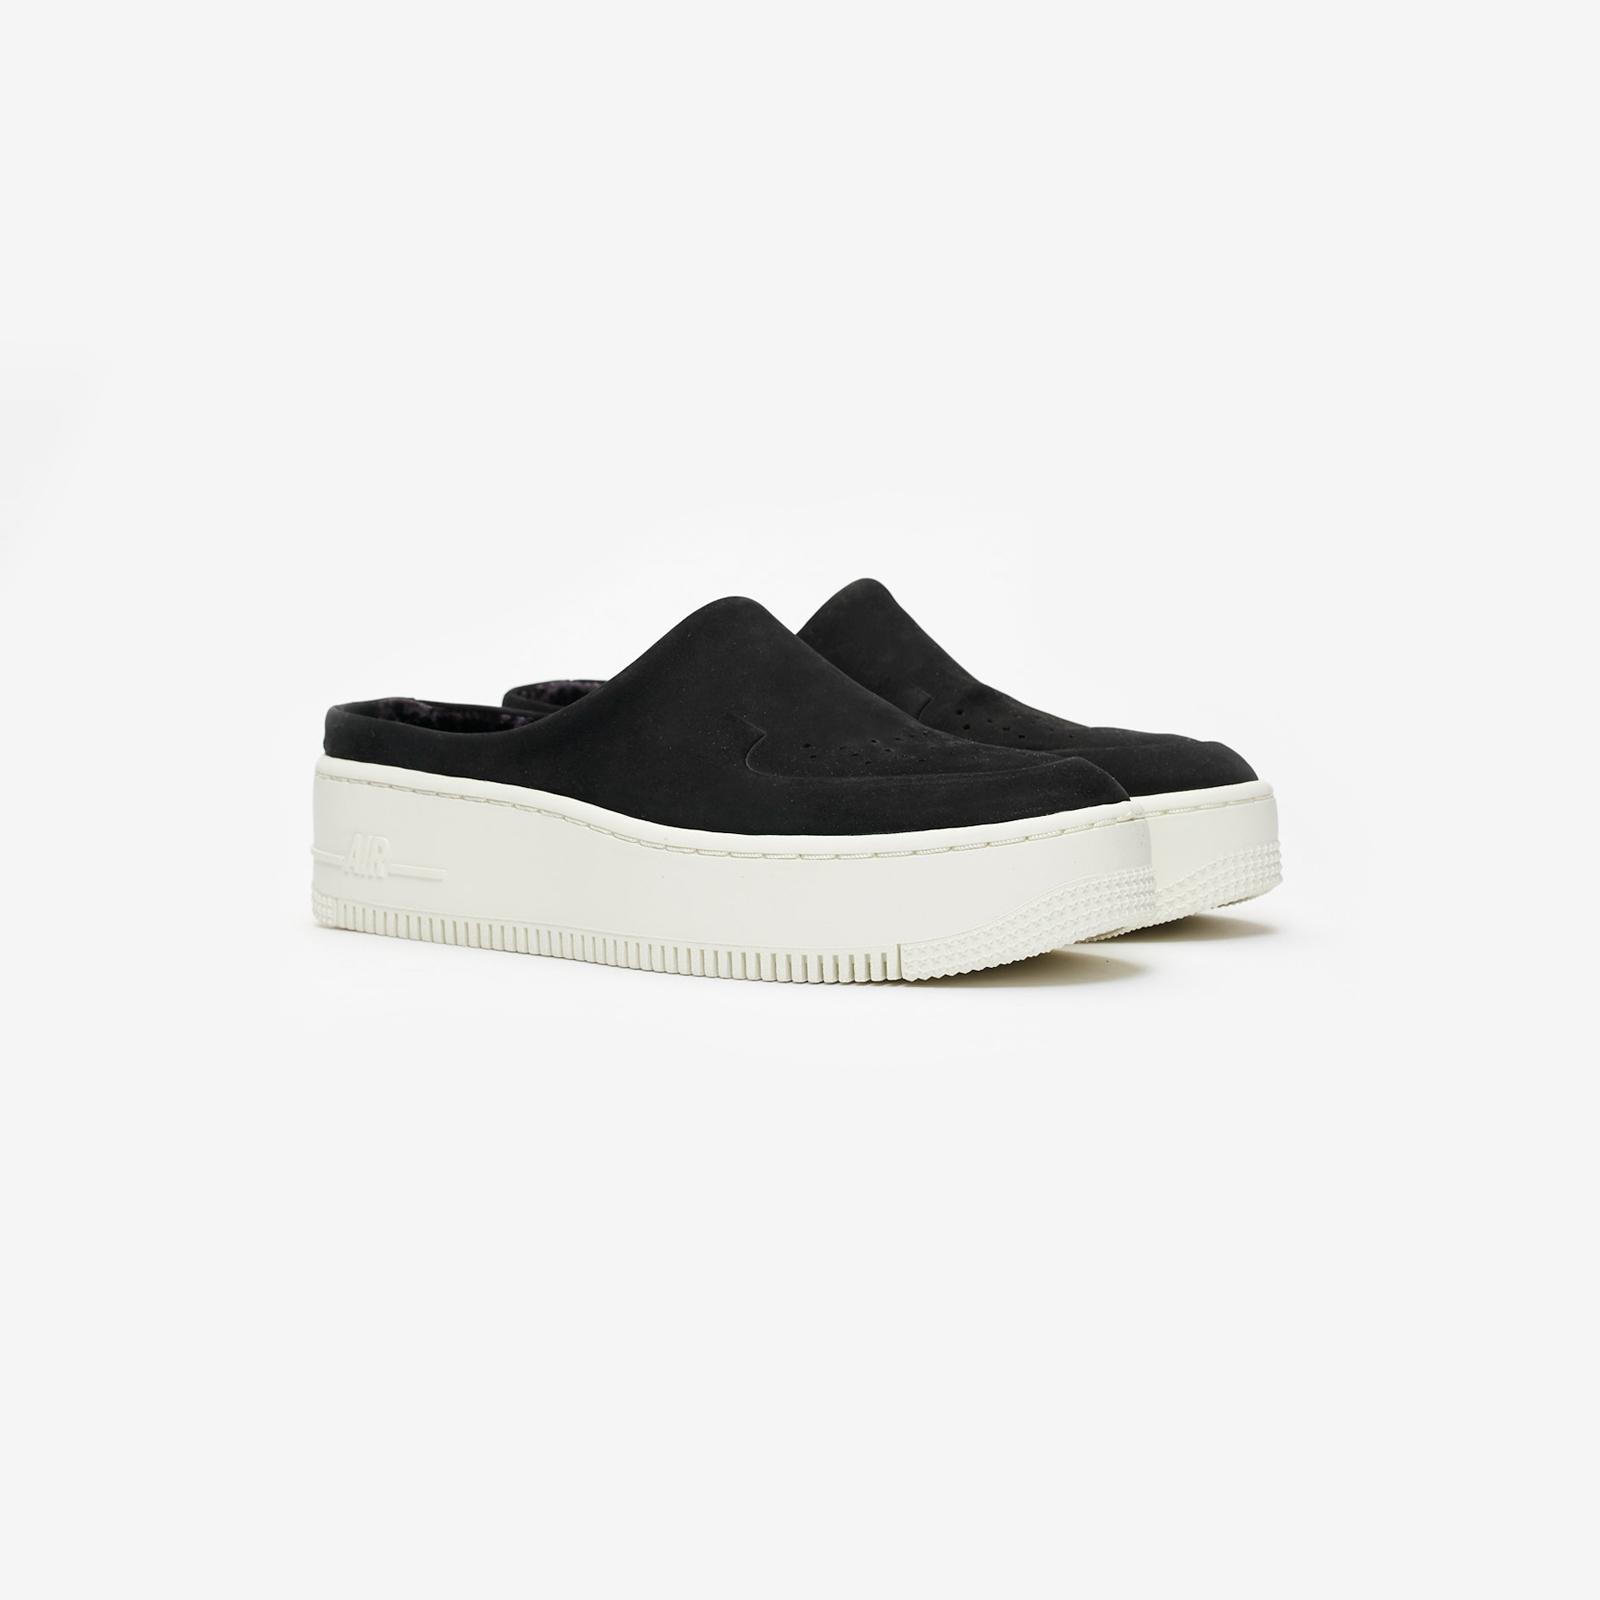 Nike W AF1 Lover XX Premium - Bv8249-001 - Sneakersnstuff  e628f13b5